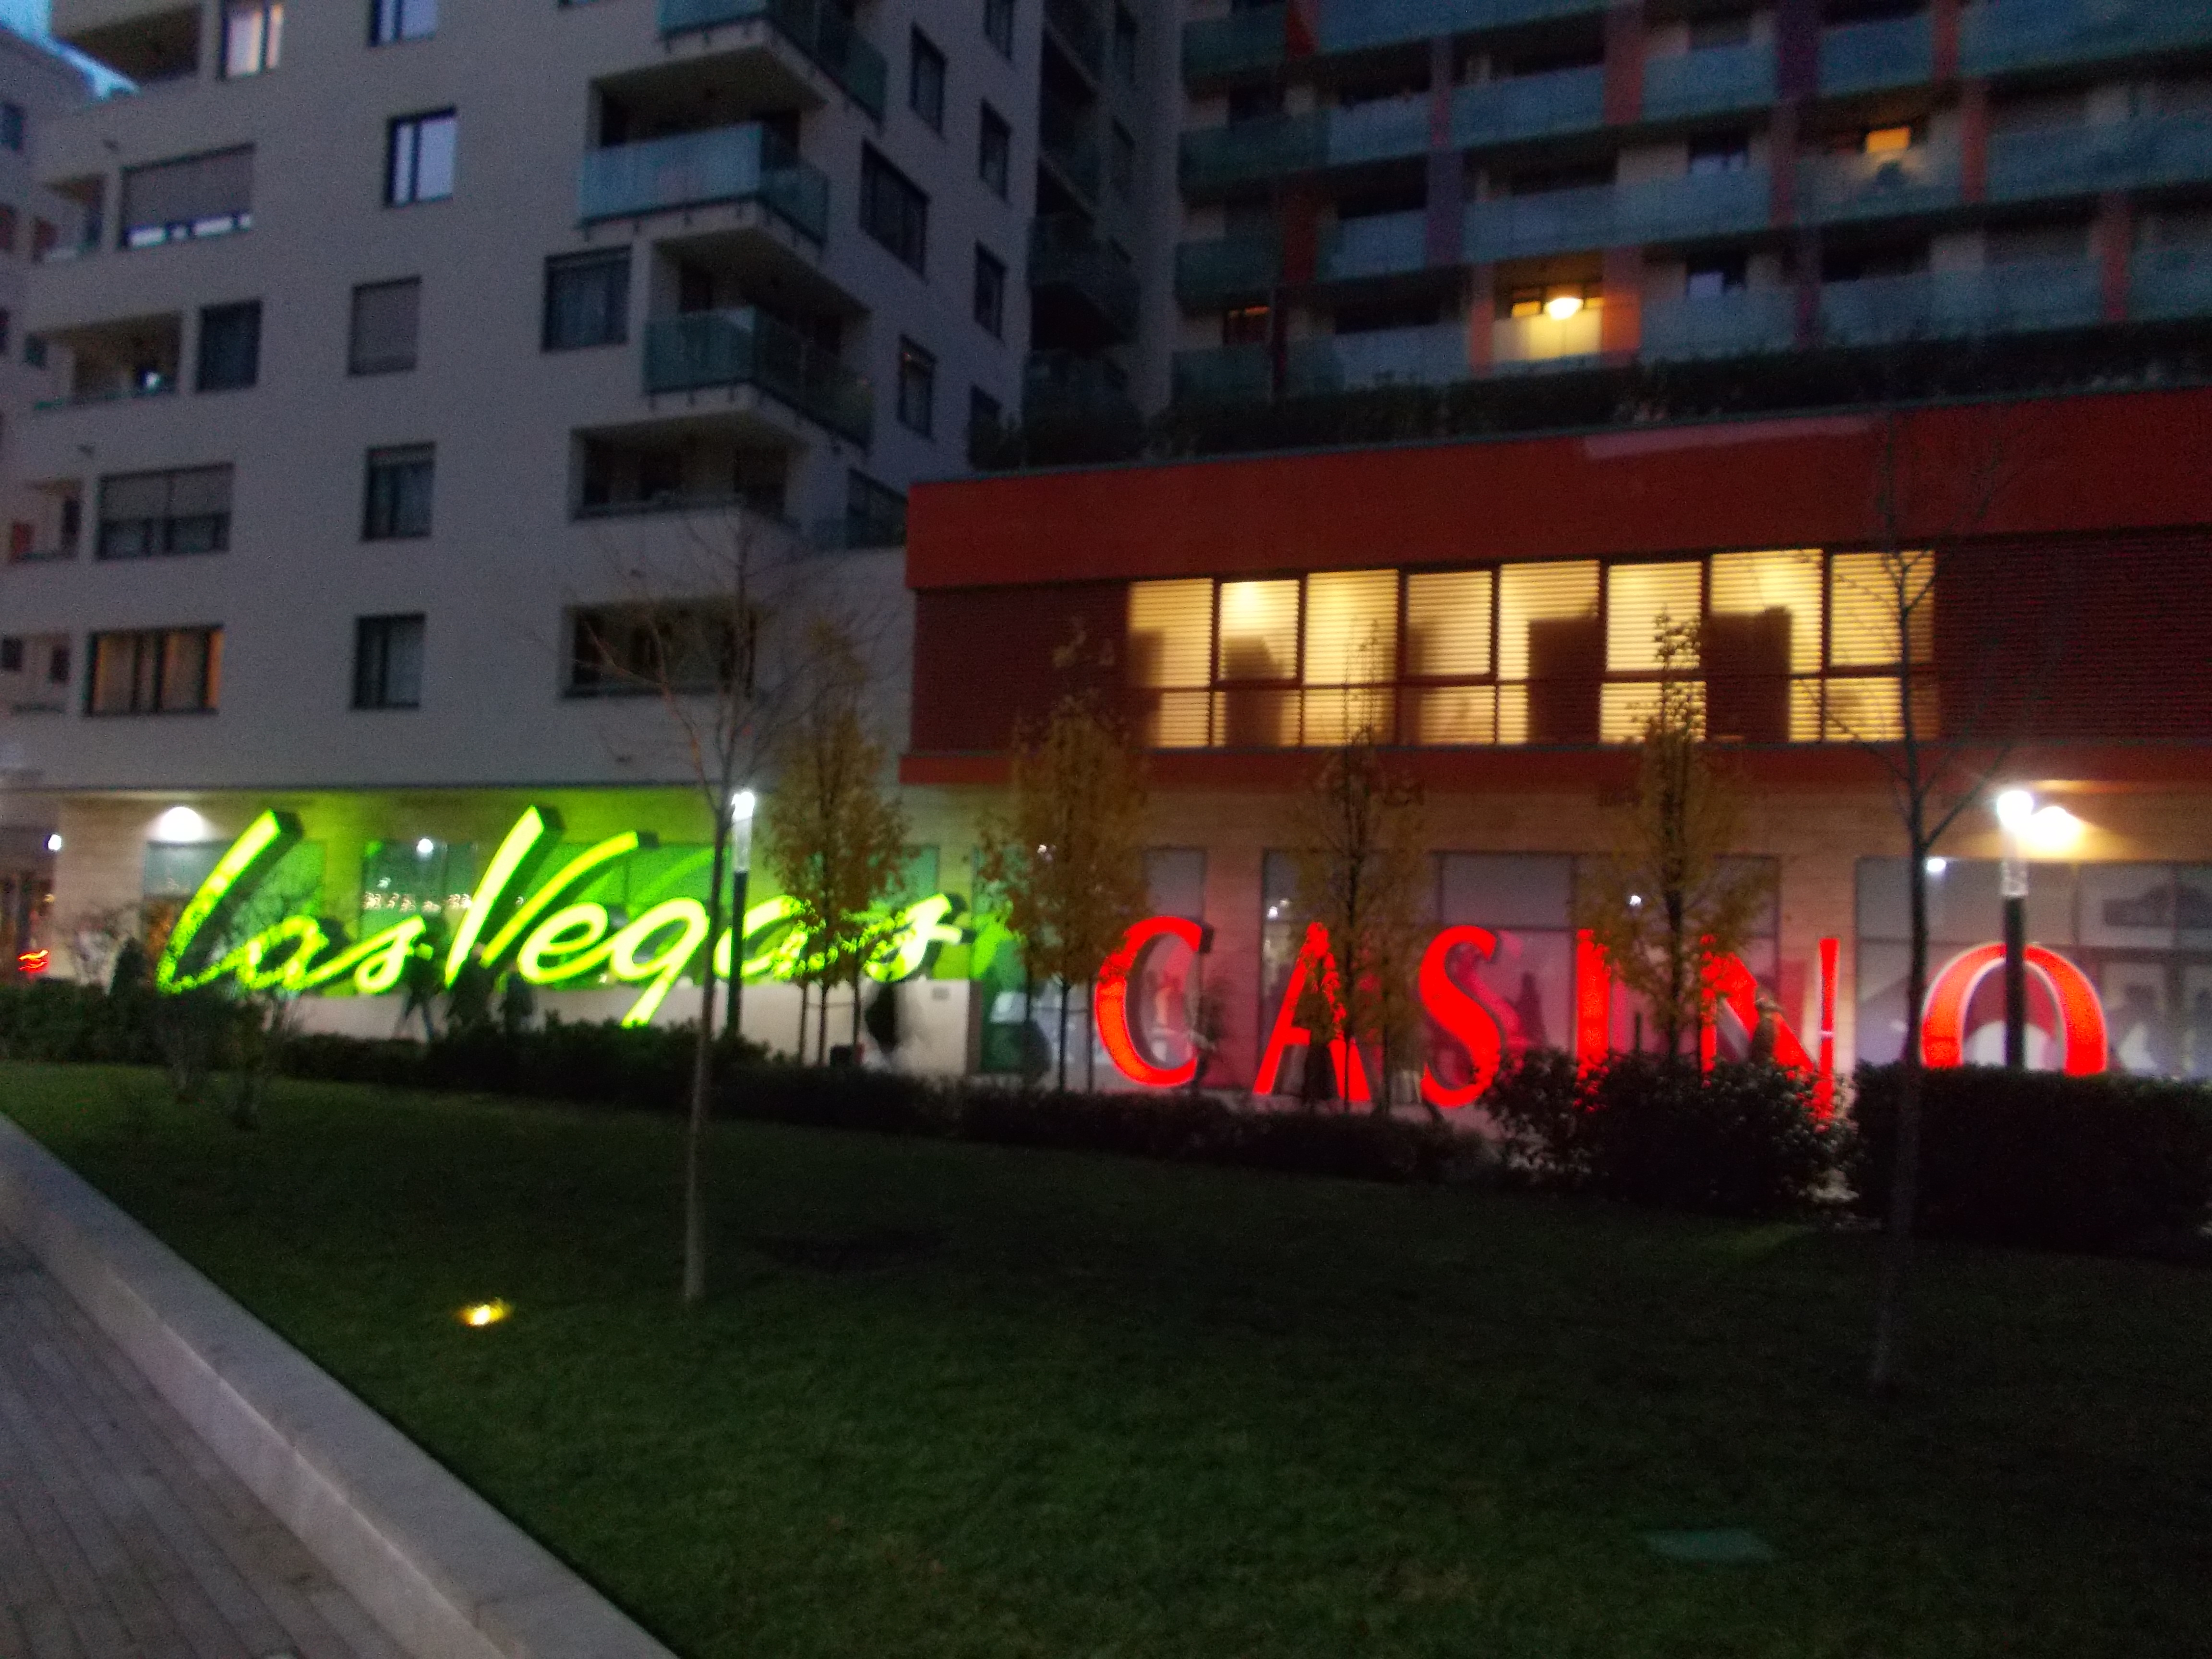 las vegas casino budapest ungarn